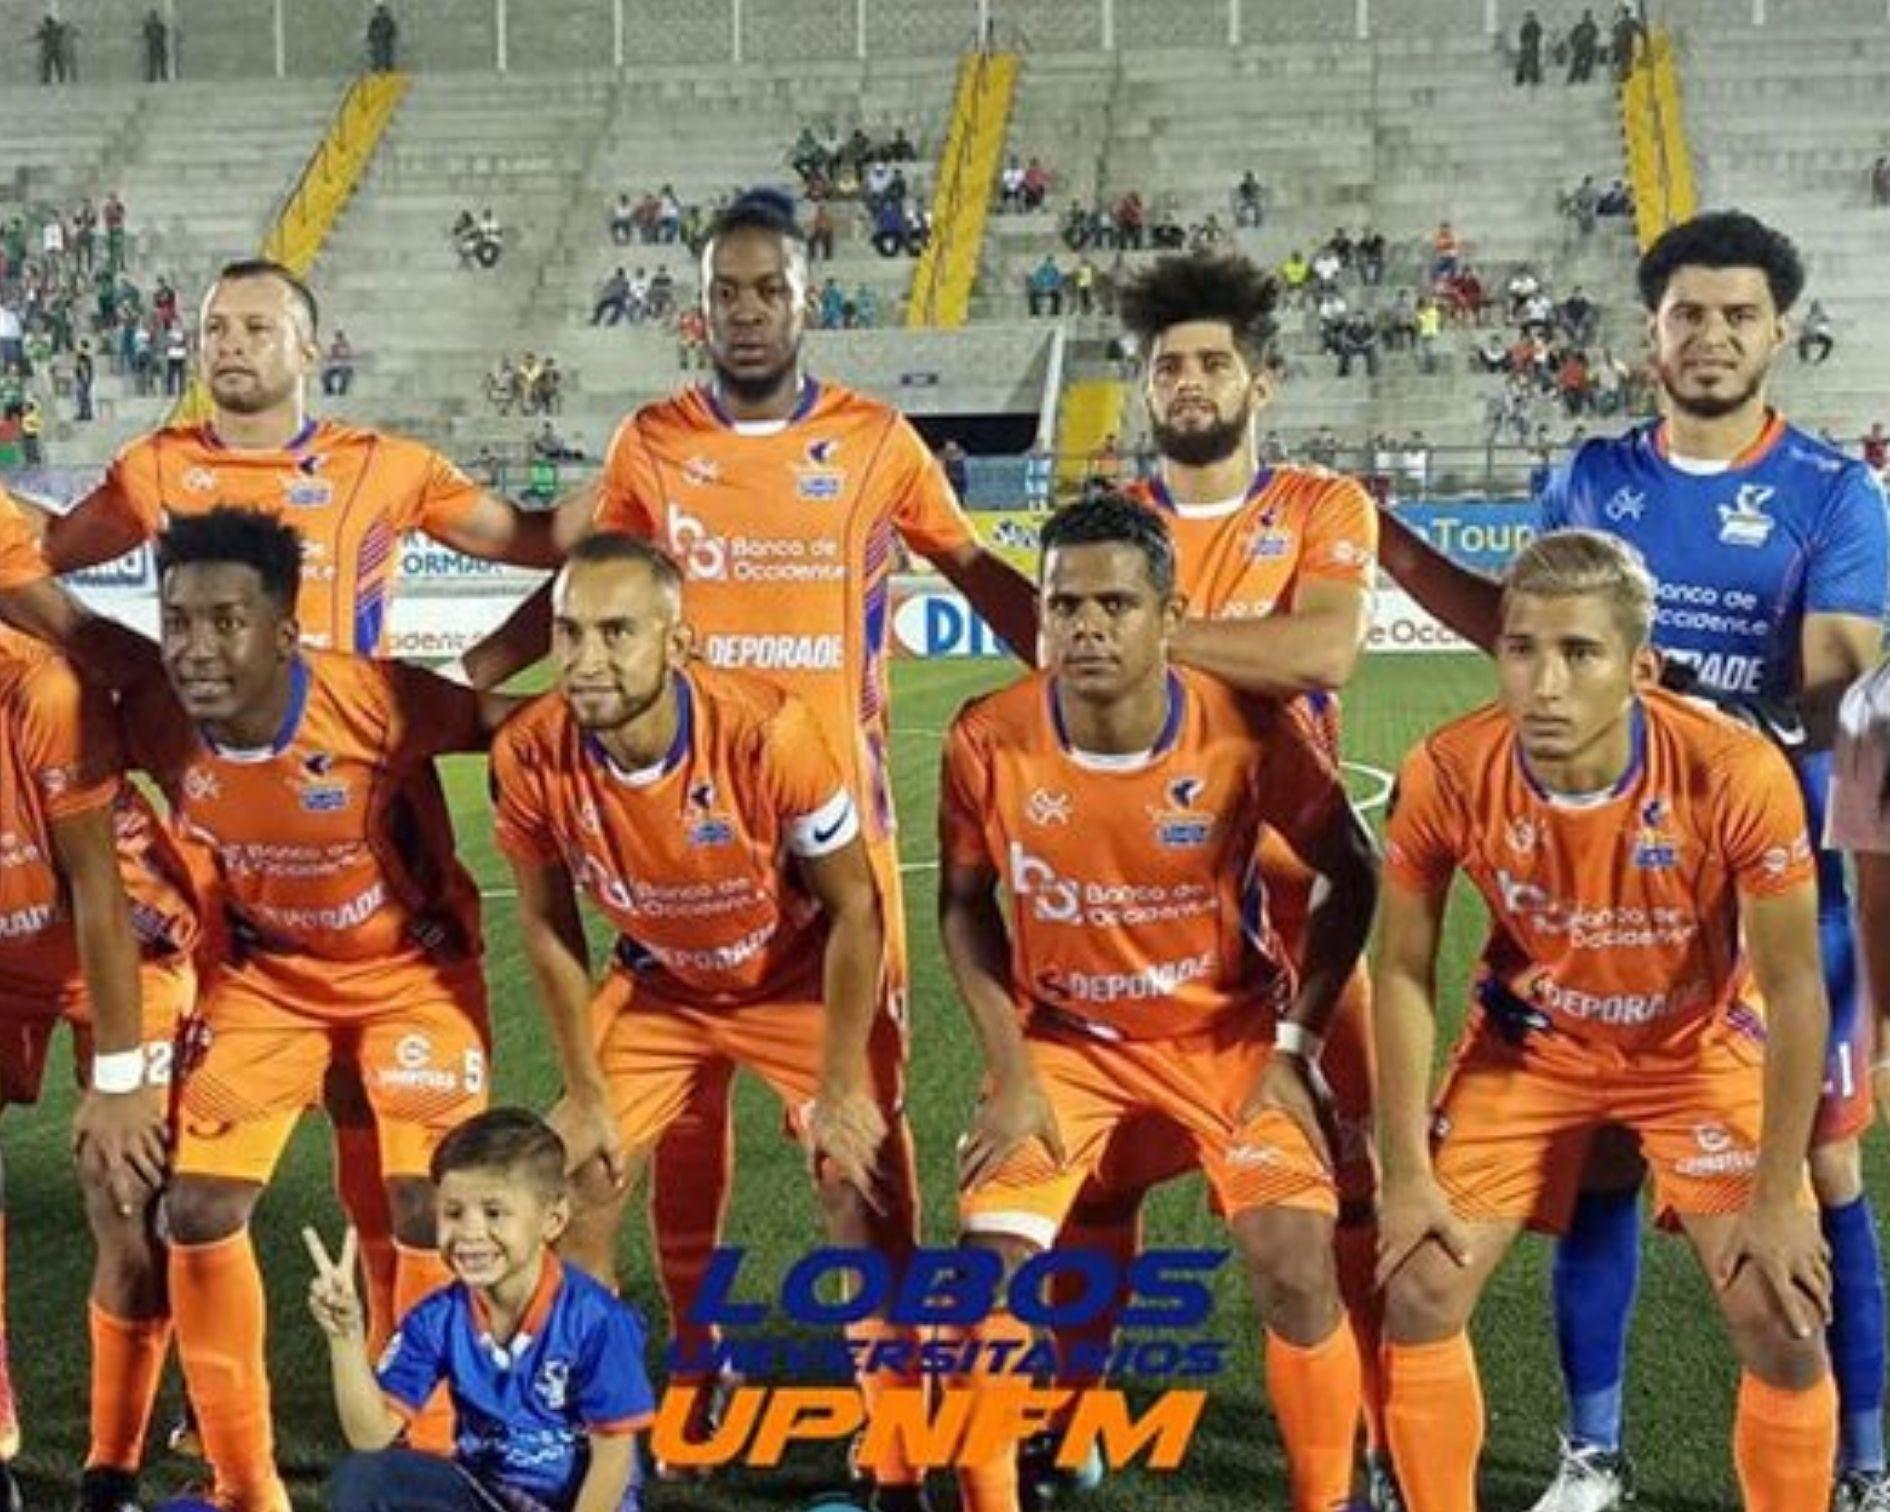 Fuertes acusaciones de jugador de la UPNFM en contra de Motagua